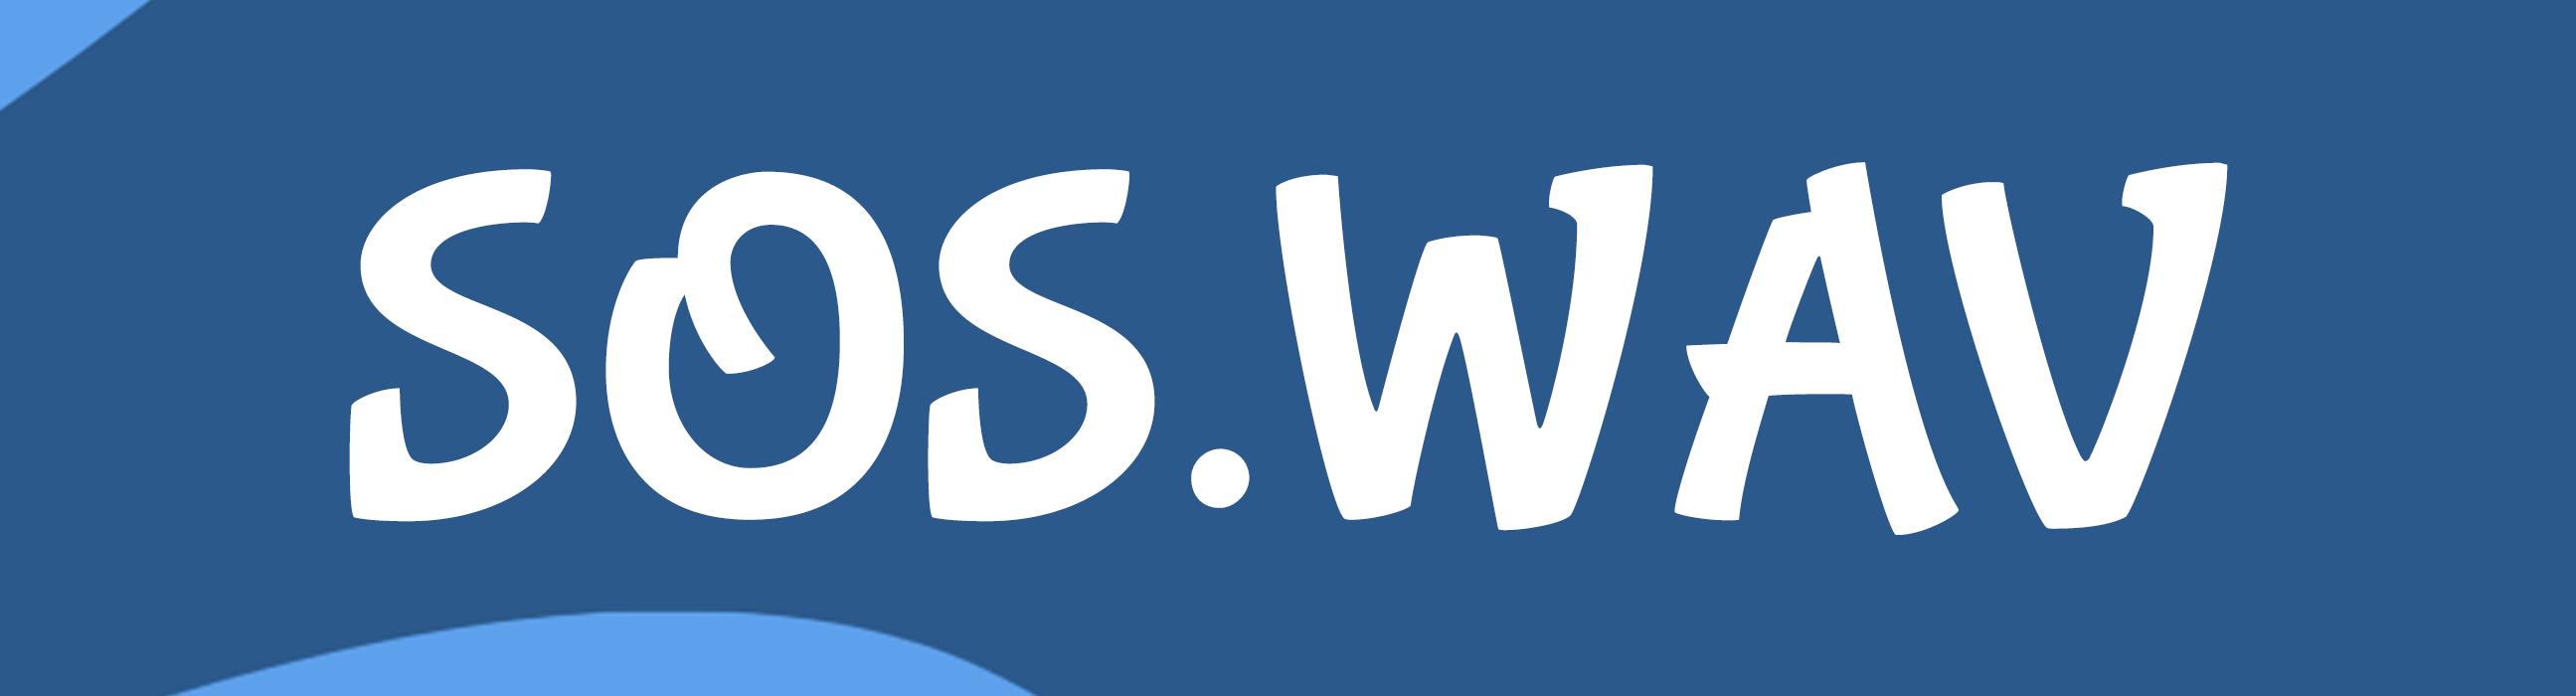 SOS.WAV